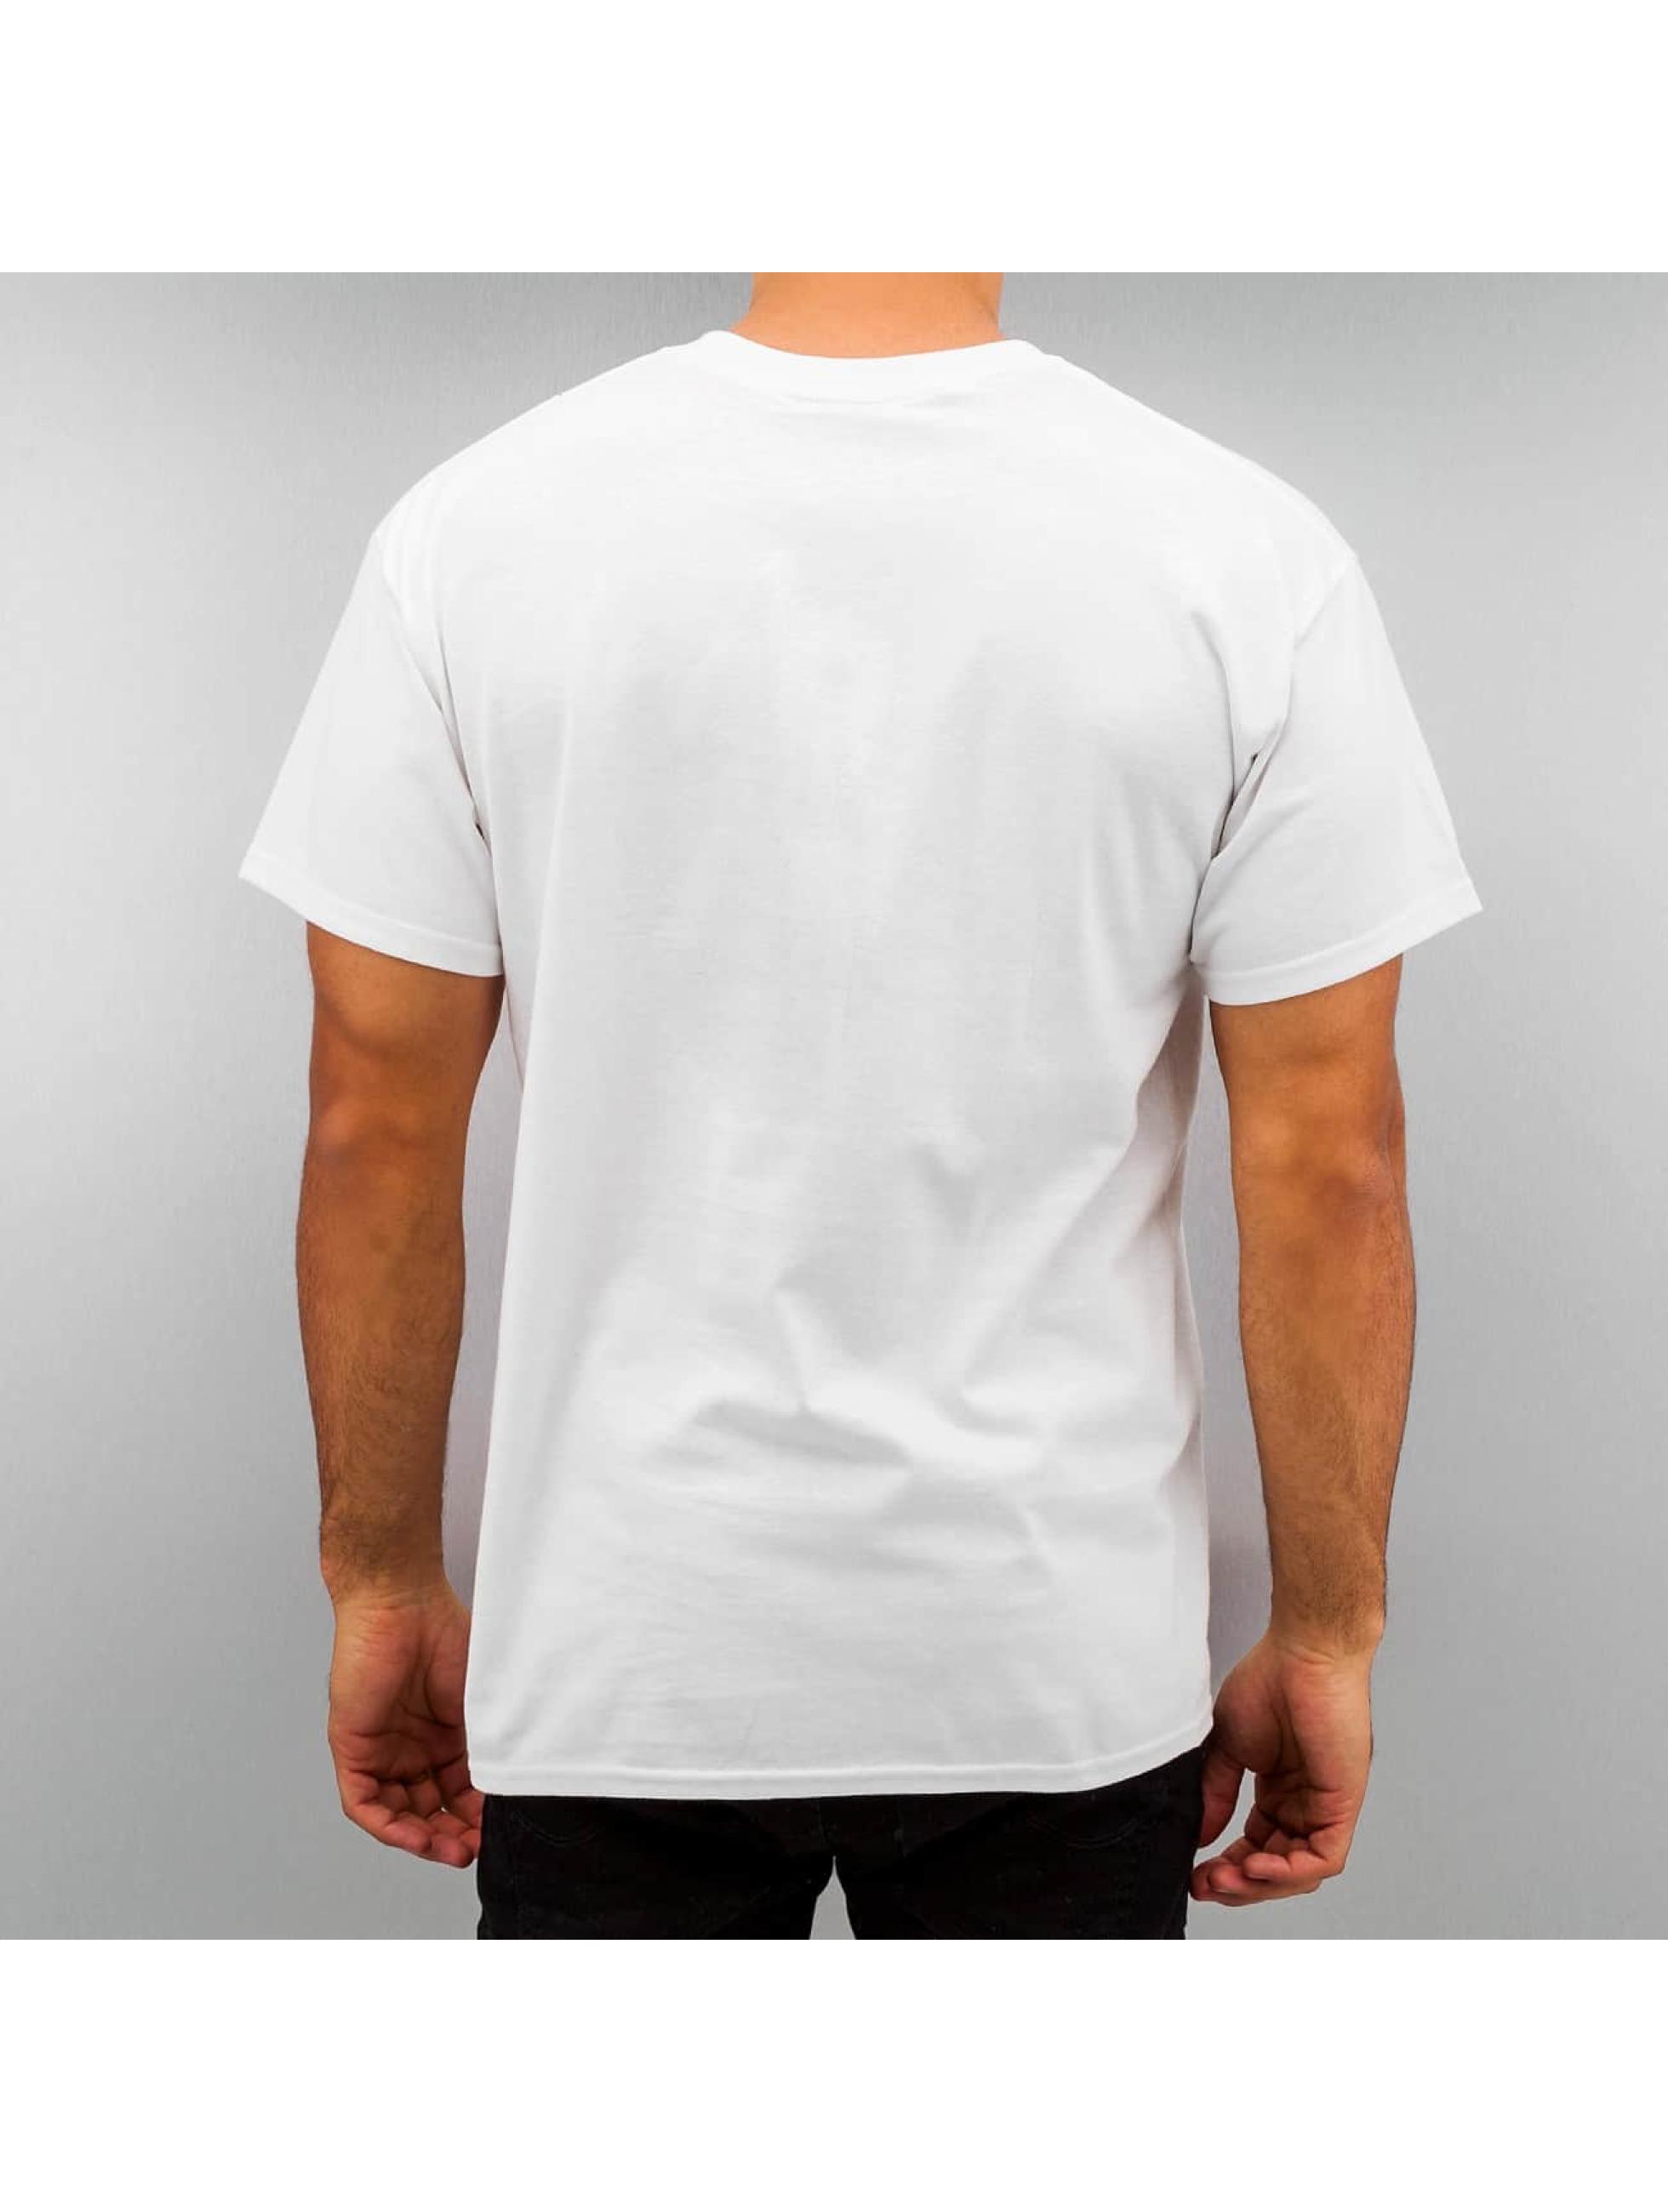 Joker t-shirt King wit